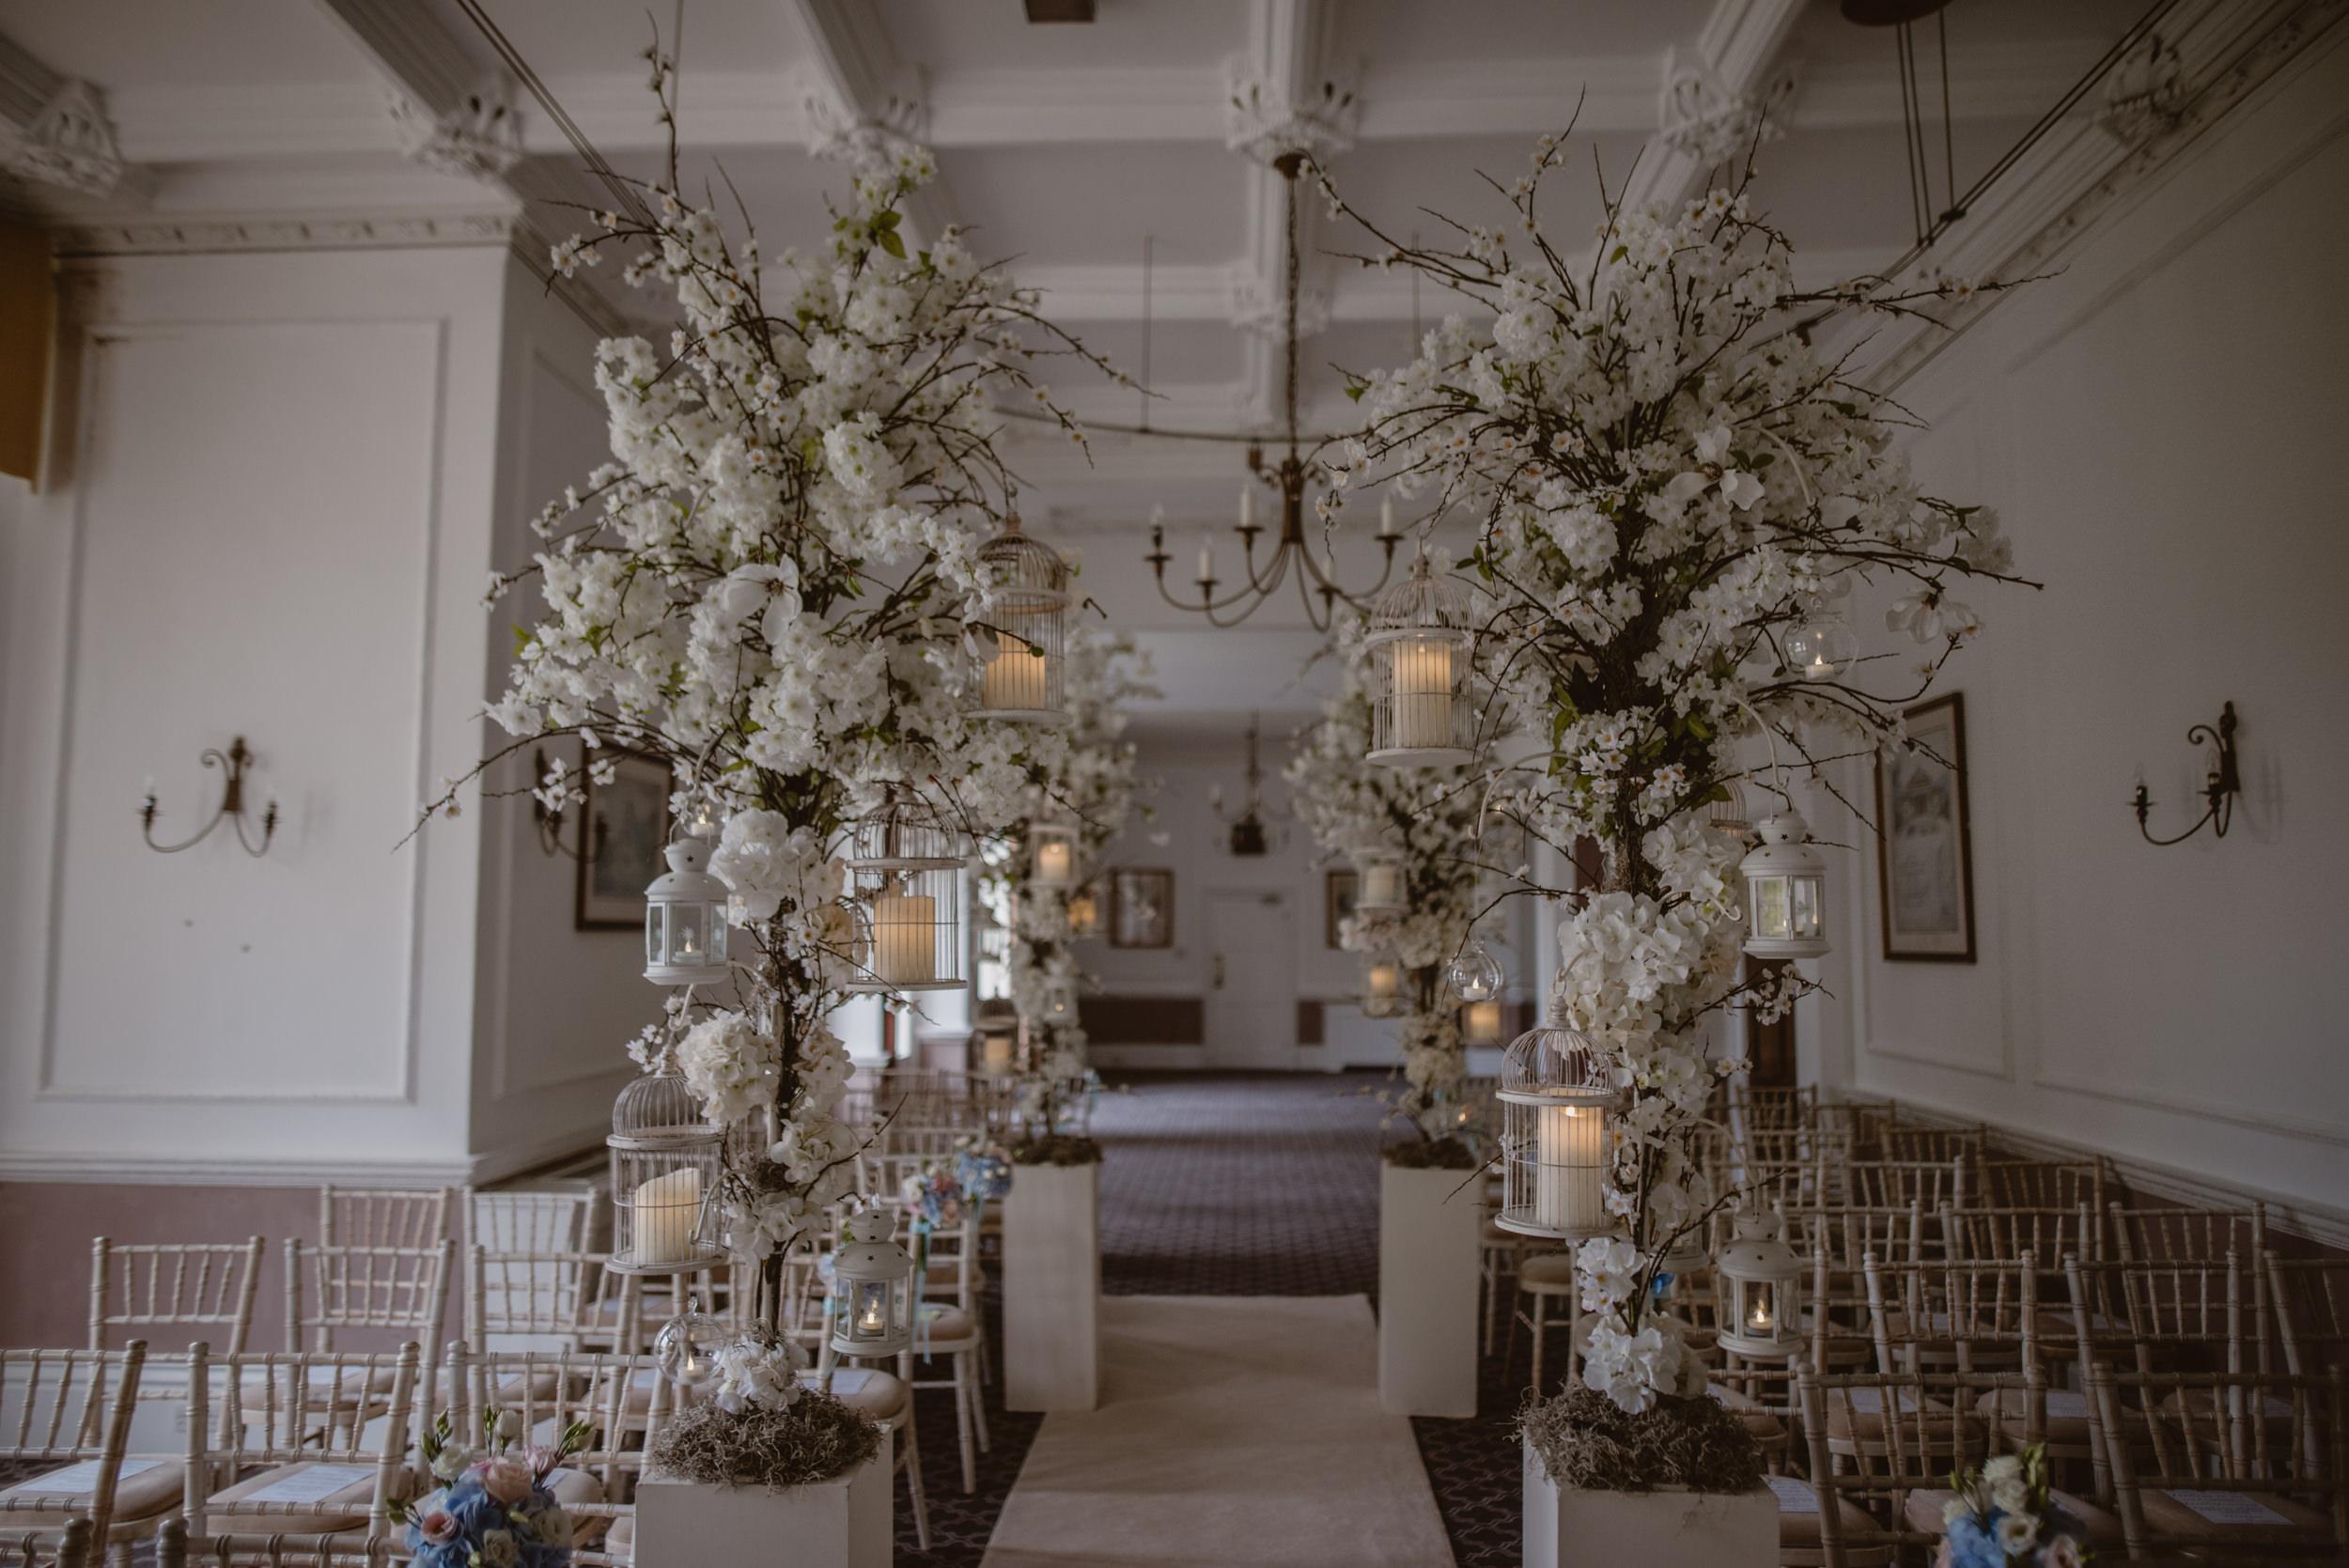 Rachel-and-James-Wedding-Horsley-Towers-State-Manu-Mendoza-Wedding-Photography-058.jpg